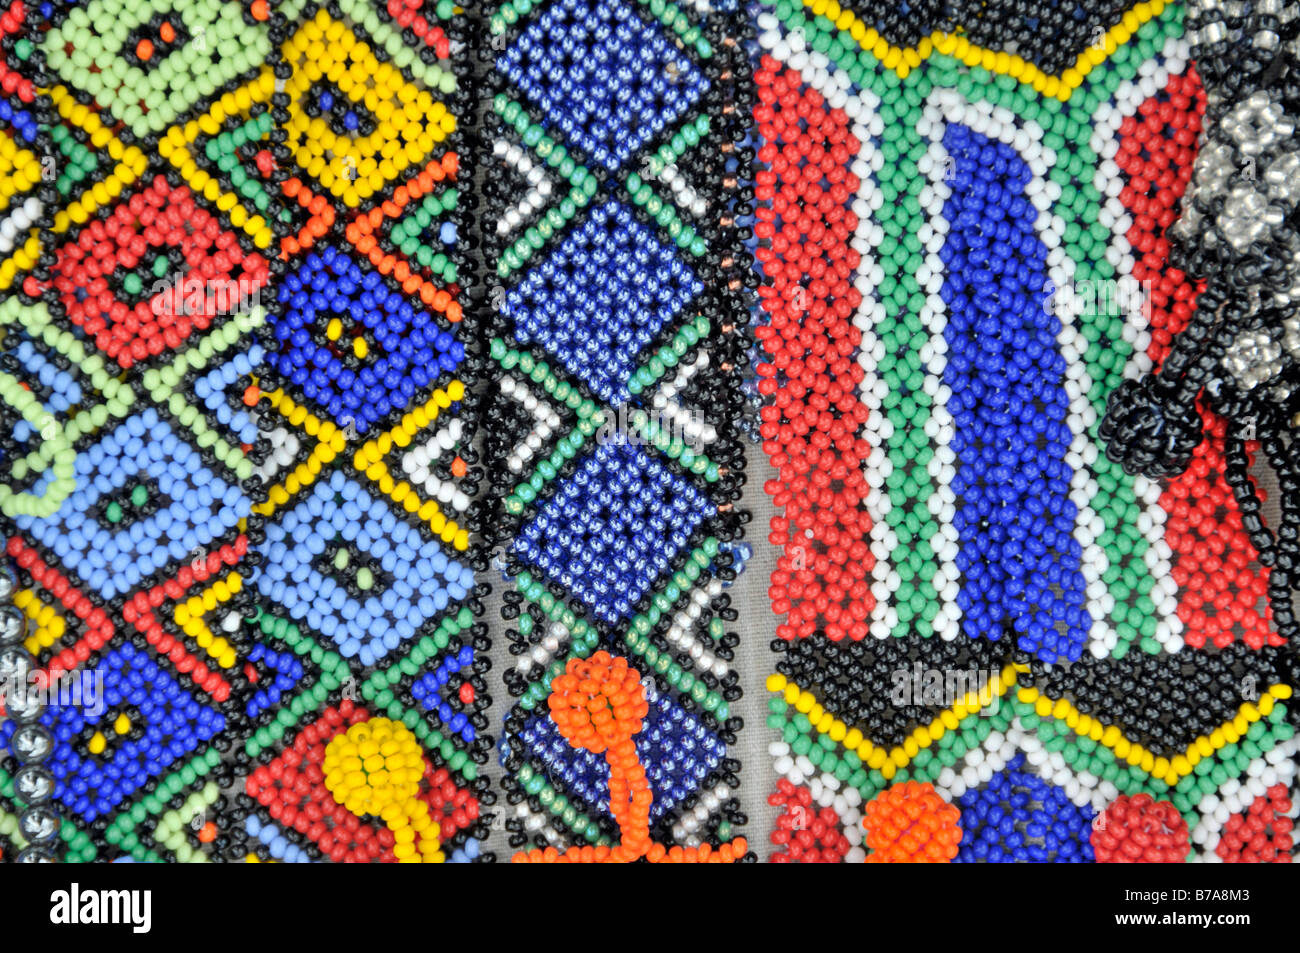 Billig Schmuck, Bulk-Artikel, Souvenirs, Santa Lucia, Südafrika, Afrika Stockbild